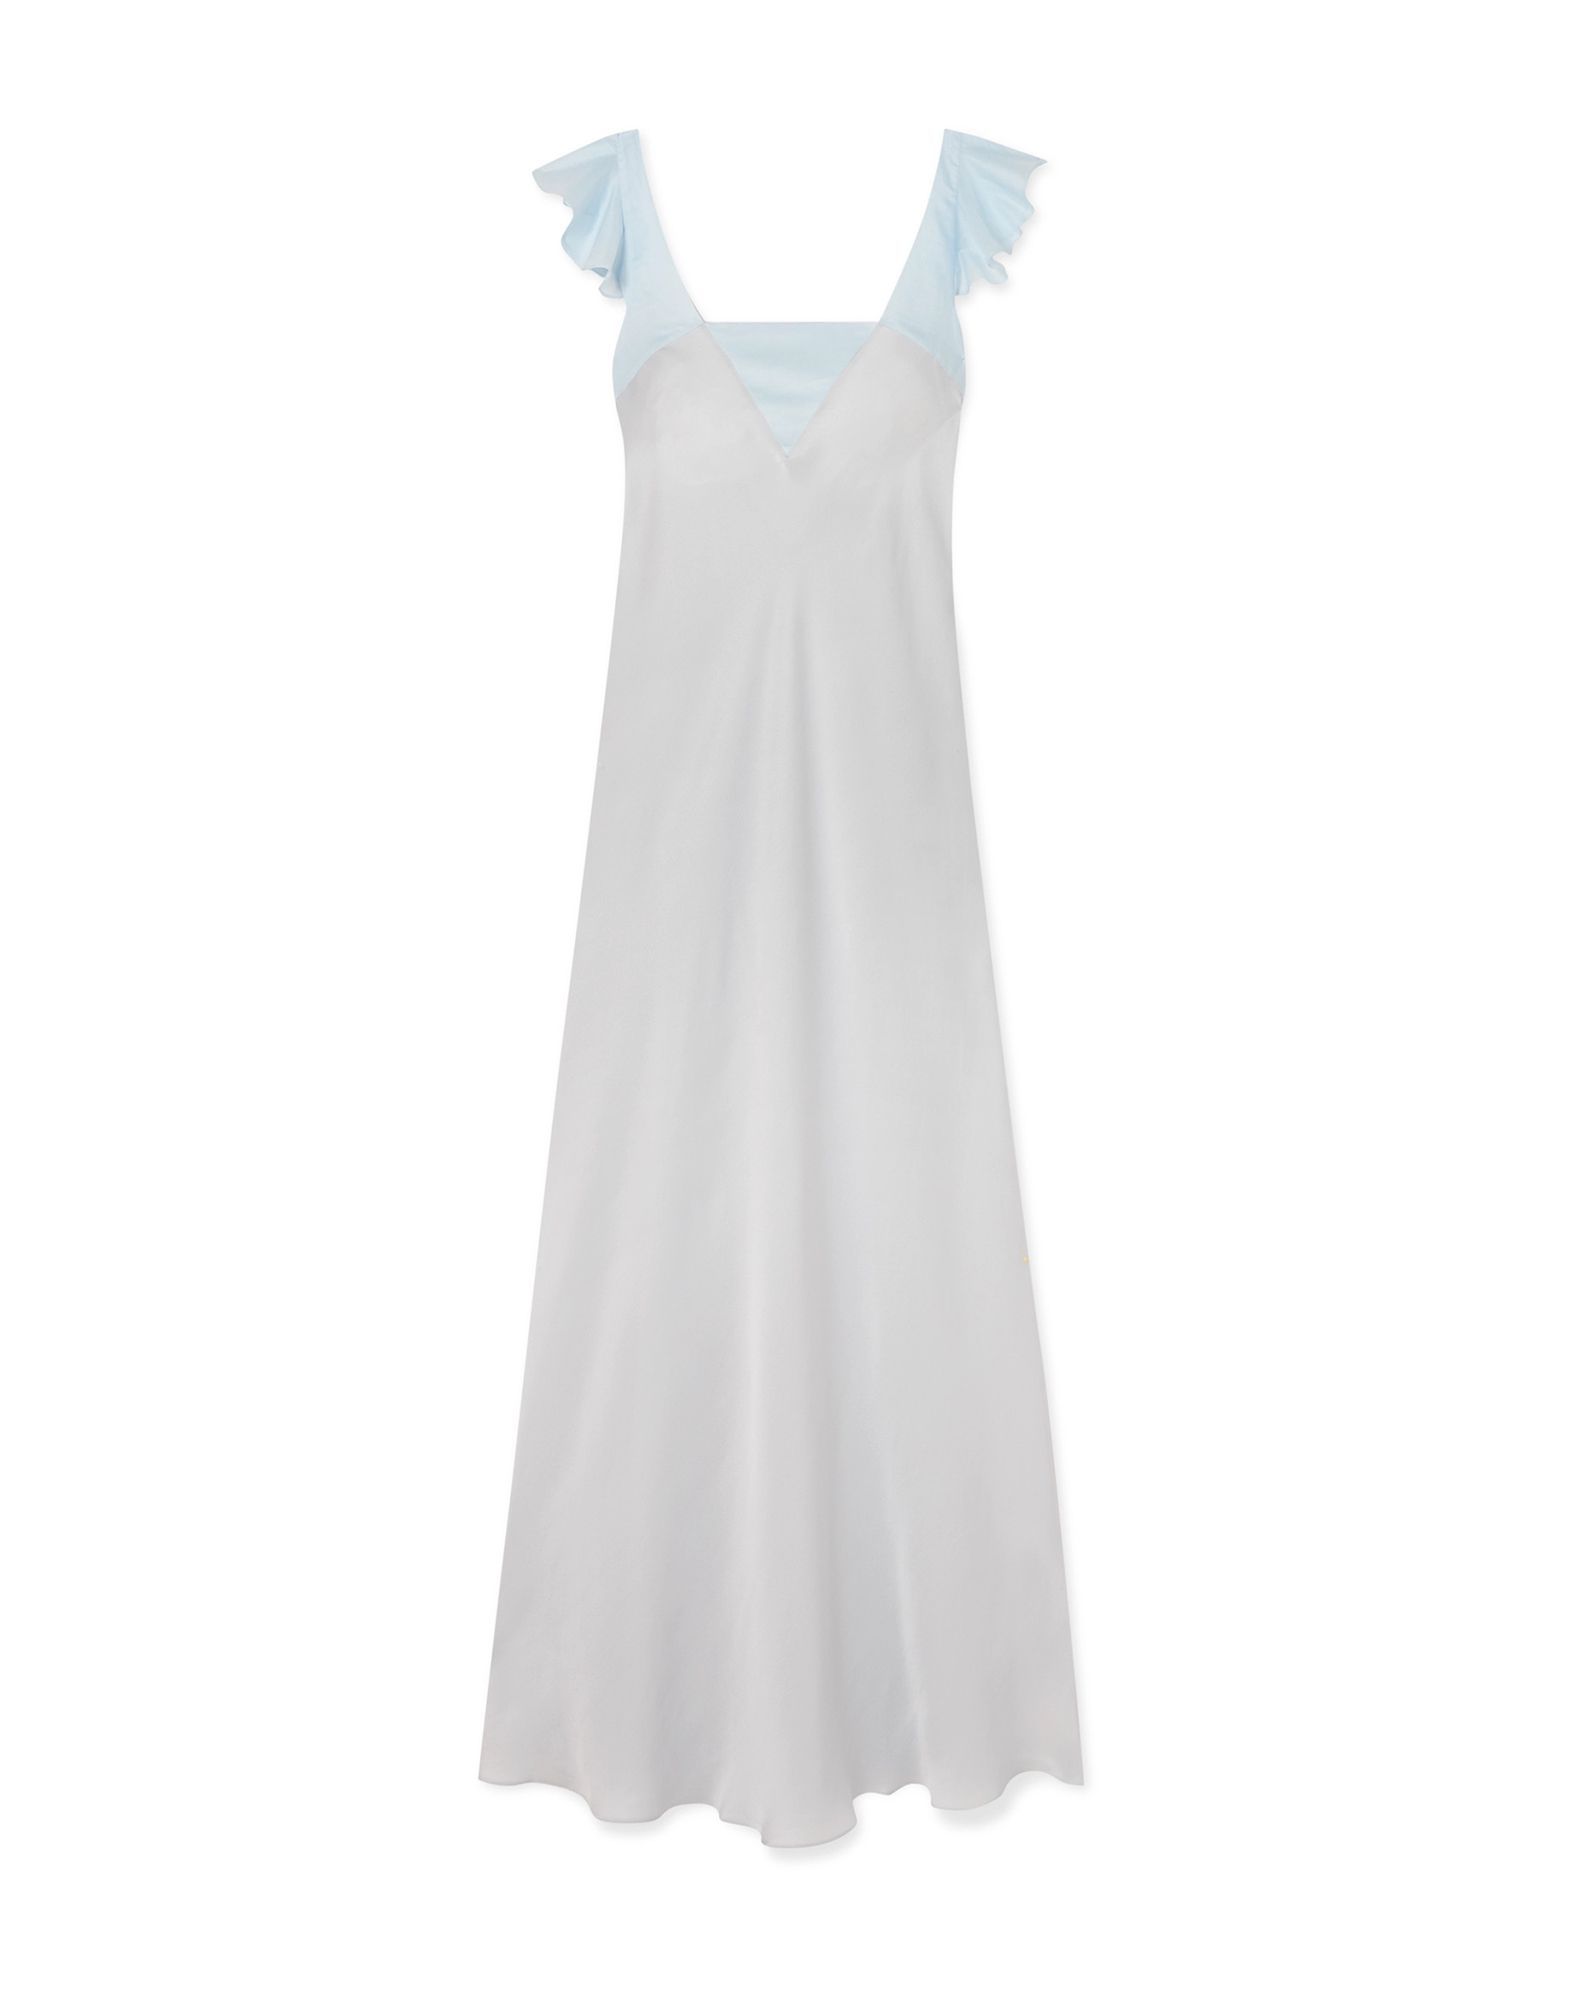 THREE GRACES LONDON Комбинация three graces london пляжное платье